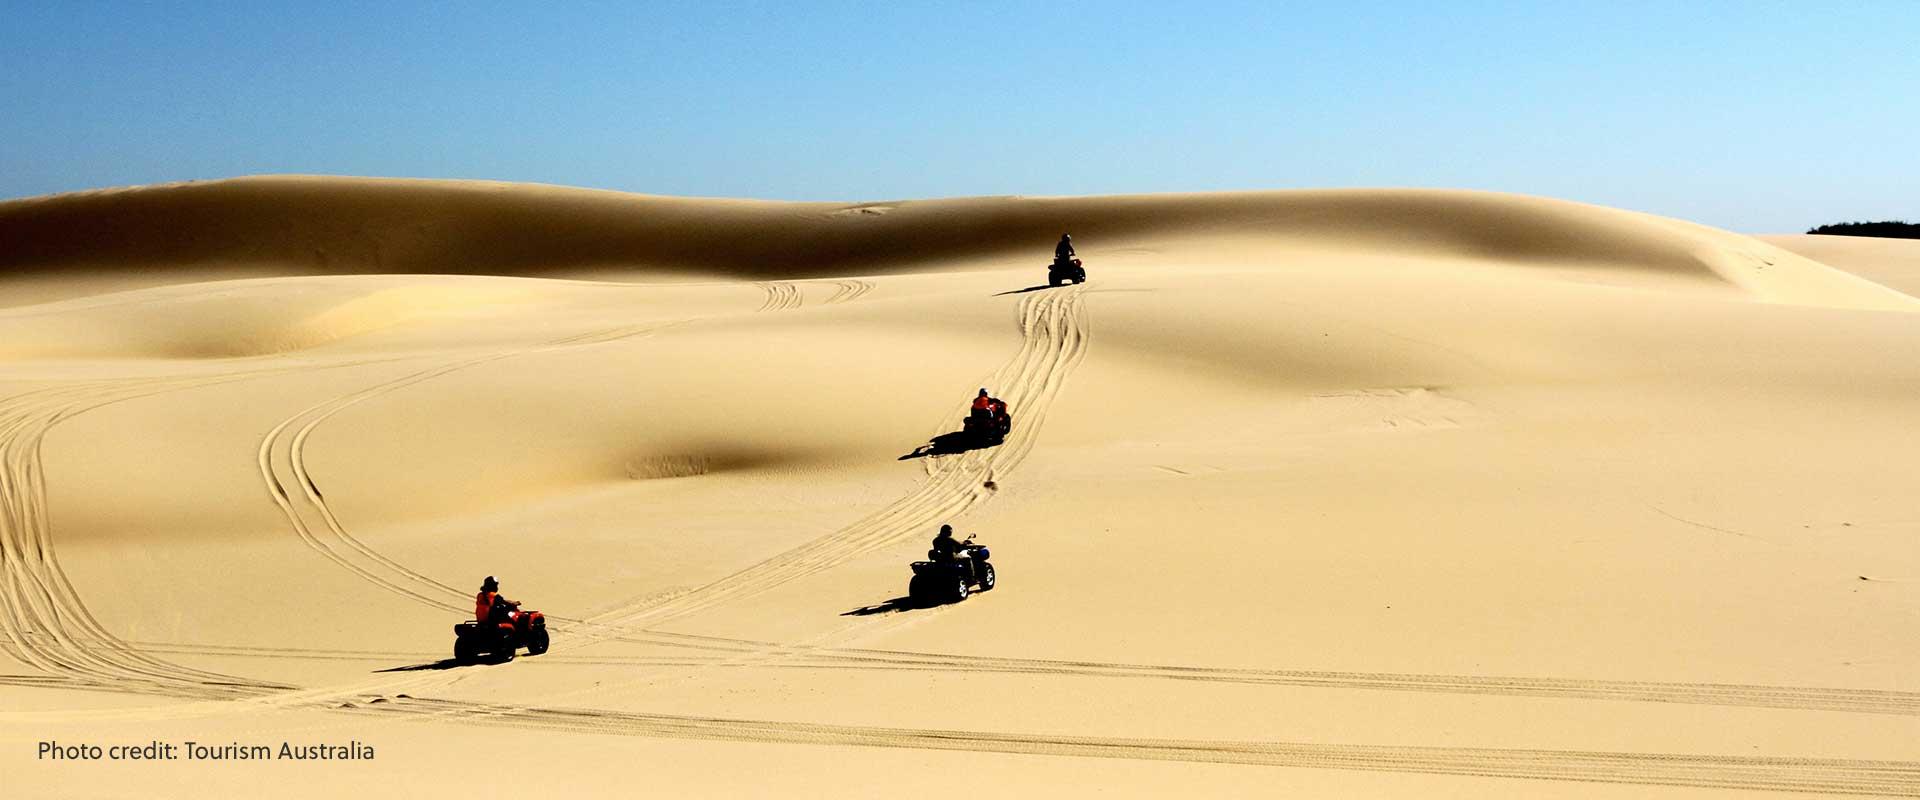 Sand Dune Adventure